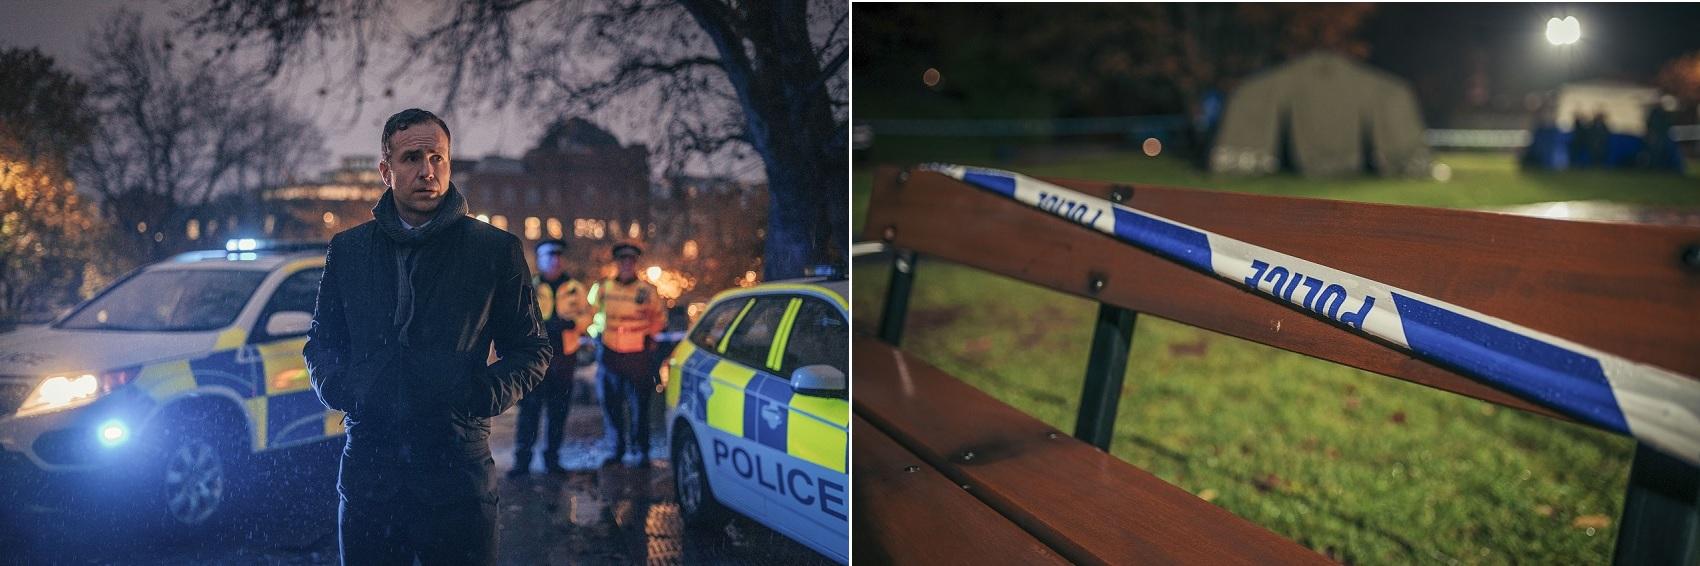 L-R Rafe Spall as Nick Bailey; police crime scene. Credit BBC / Dancing Ledge / James Pardon